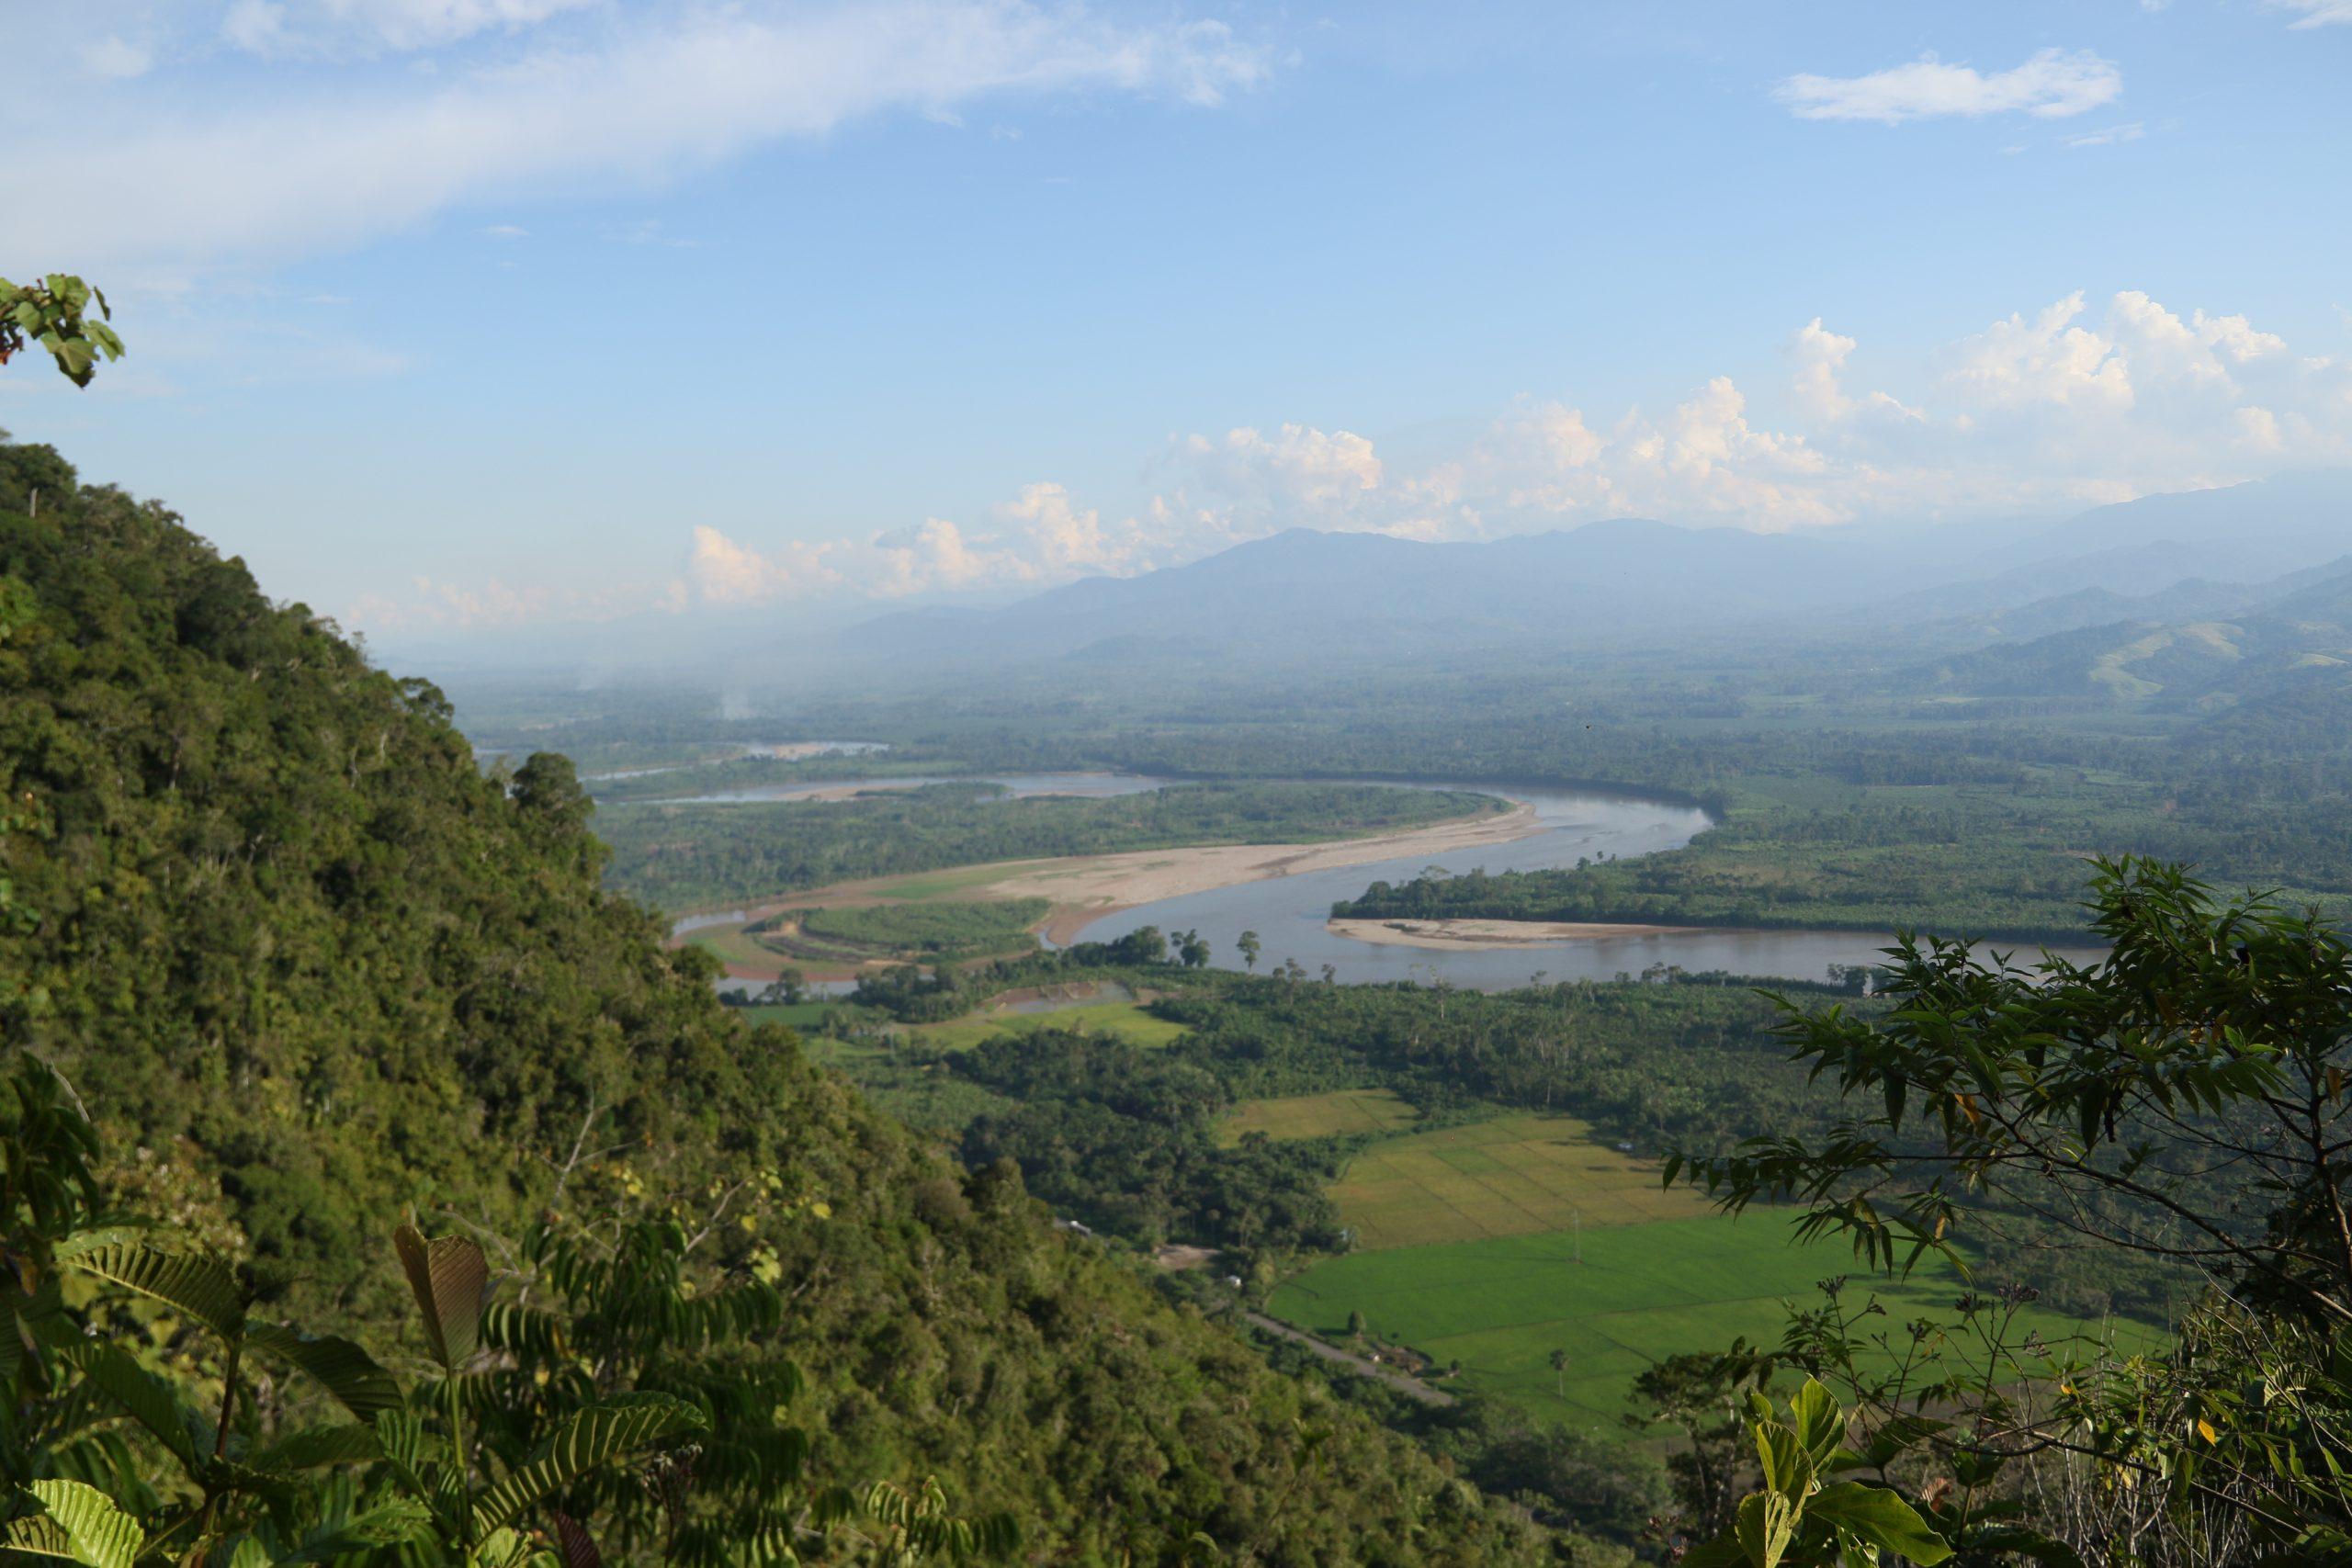 A view of the Huallaga River in Peru